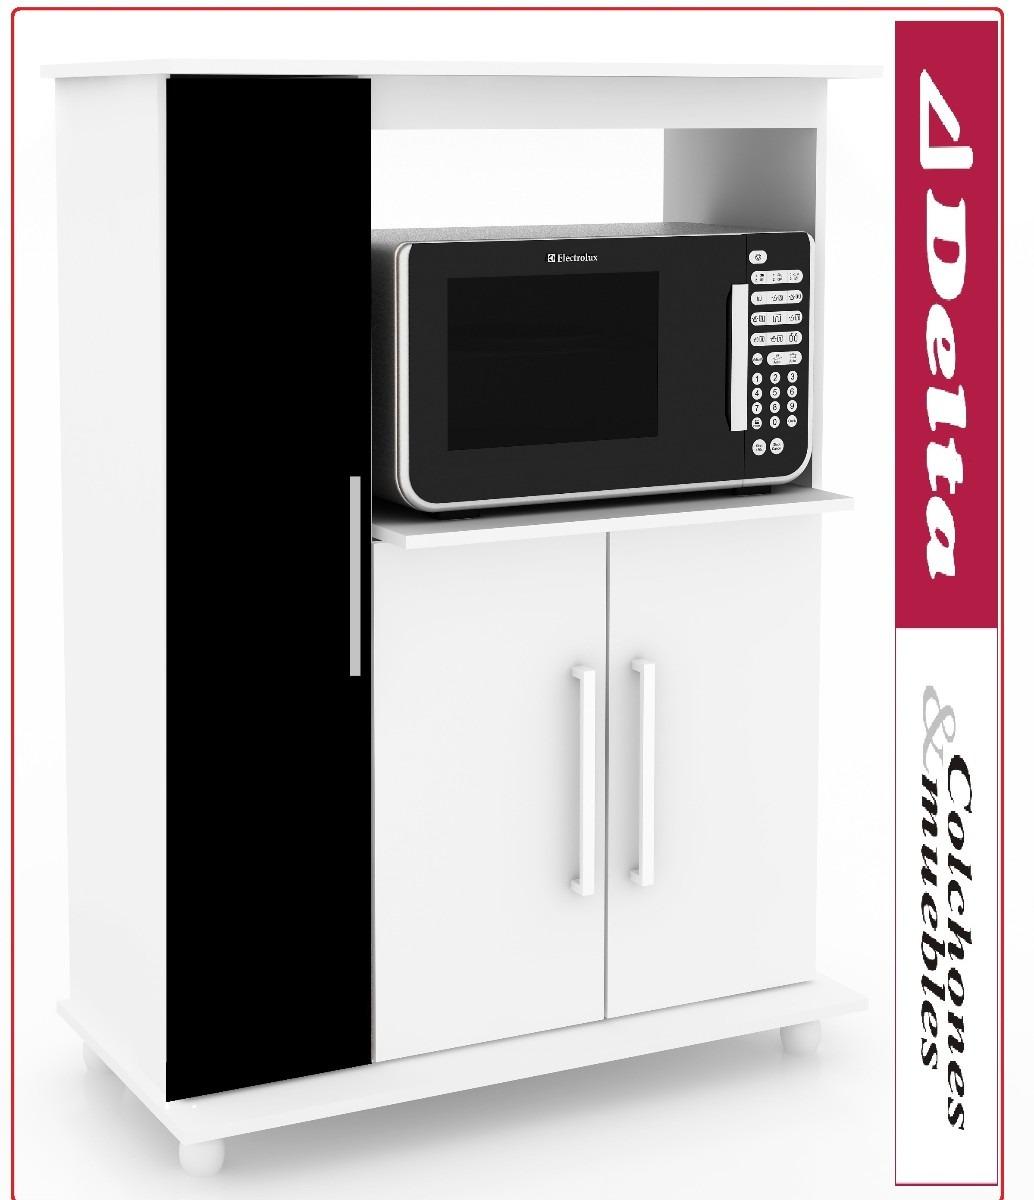 Mueble para microondas alacena kit de cocina equipamiento en mercado libre - Muebles de cocina en kit ikea ...